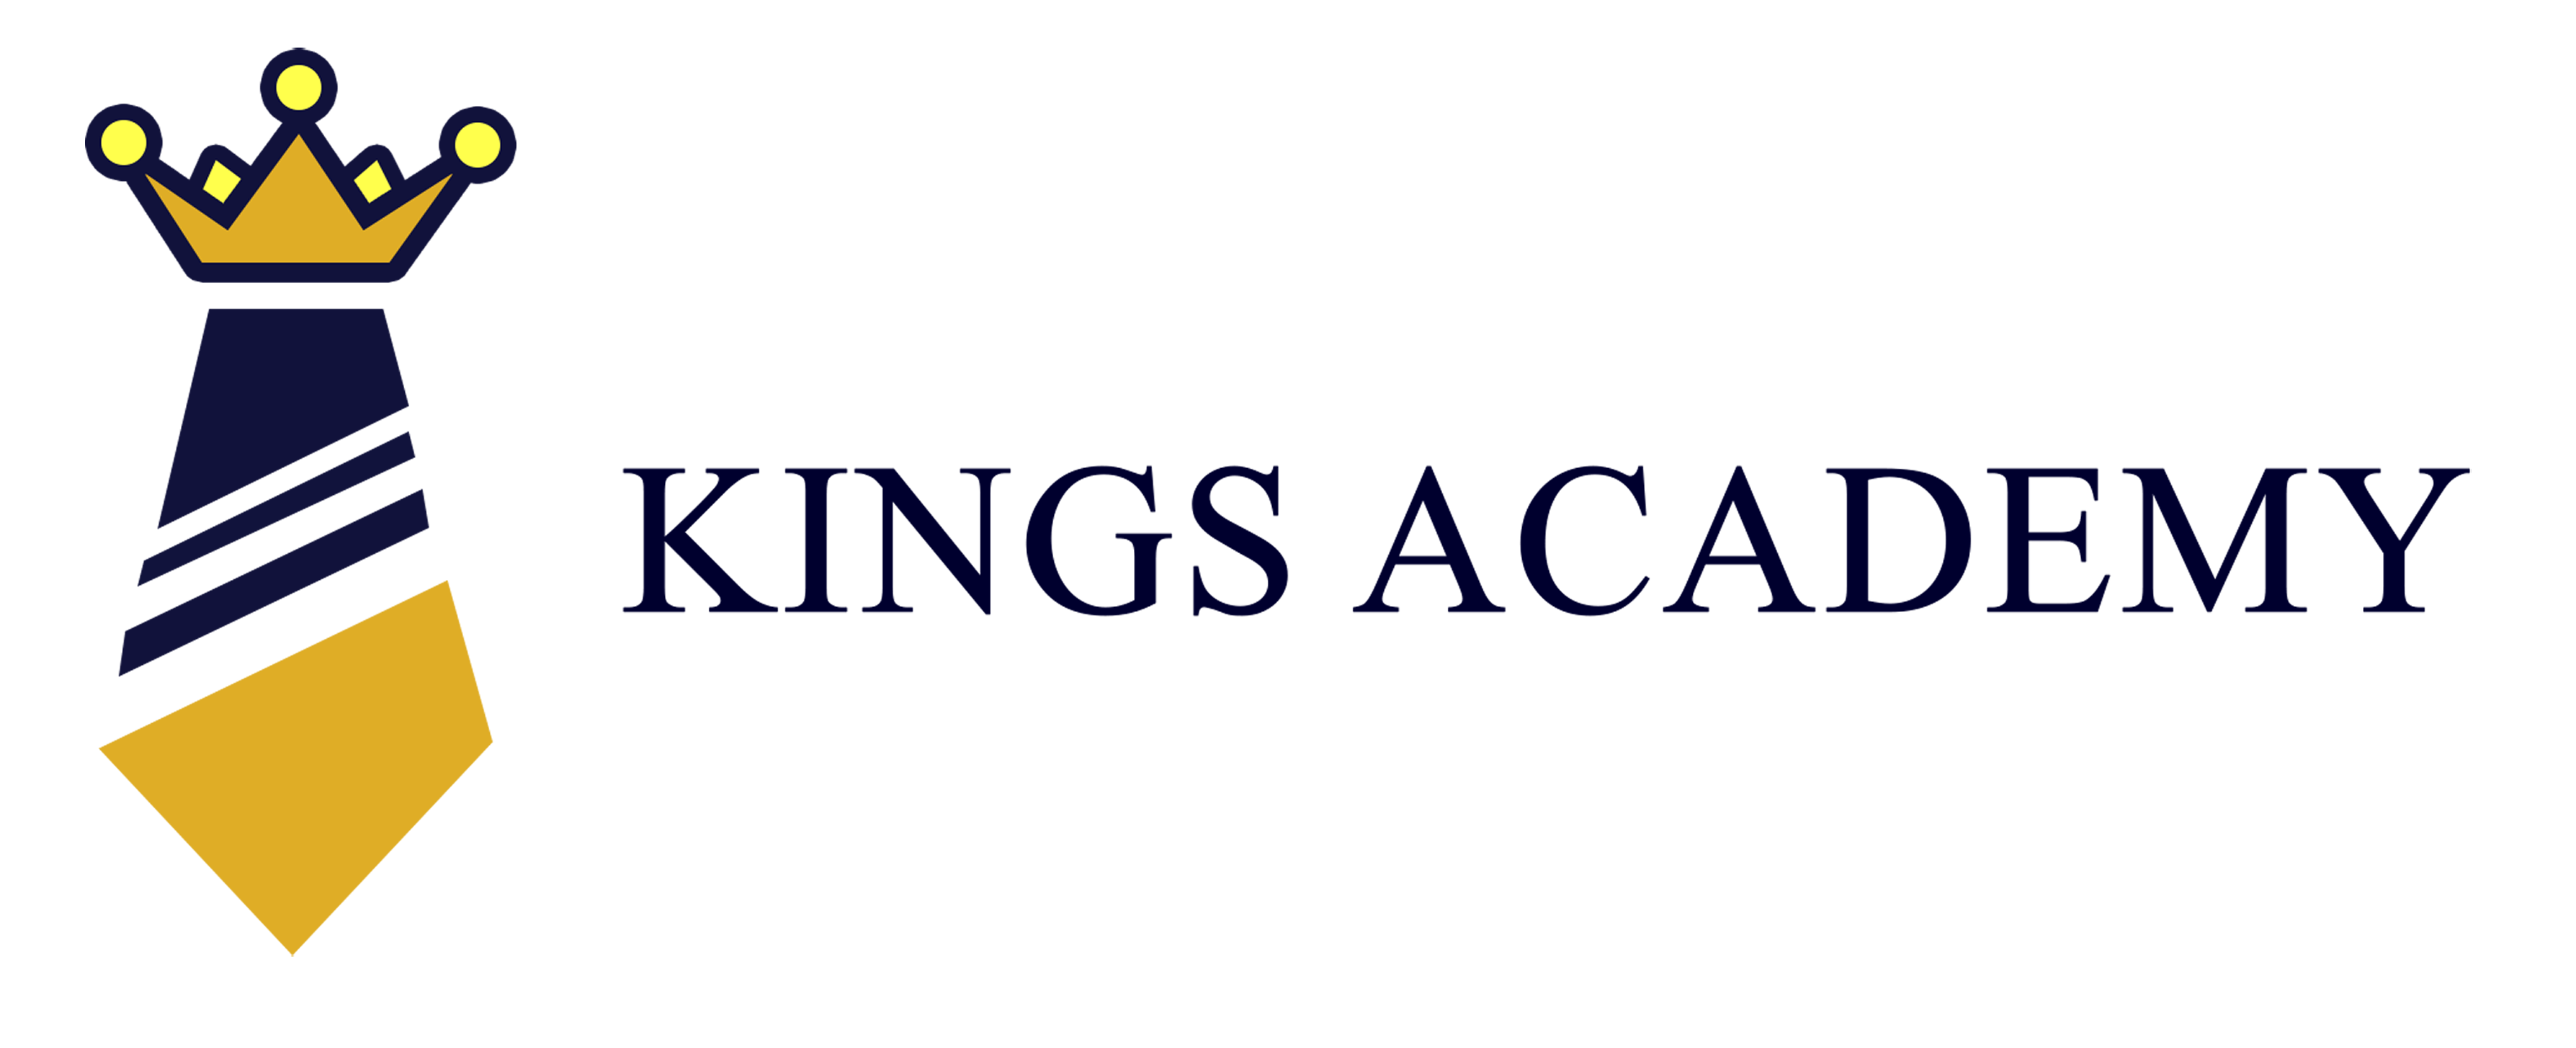 Kings Academy - Education